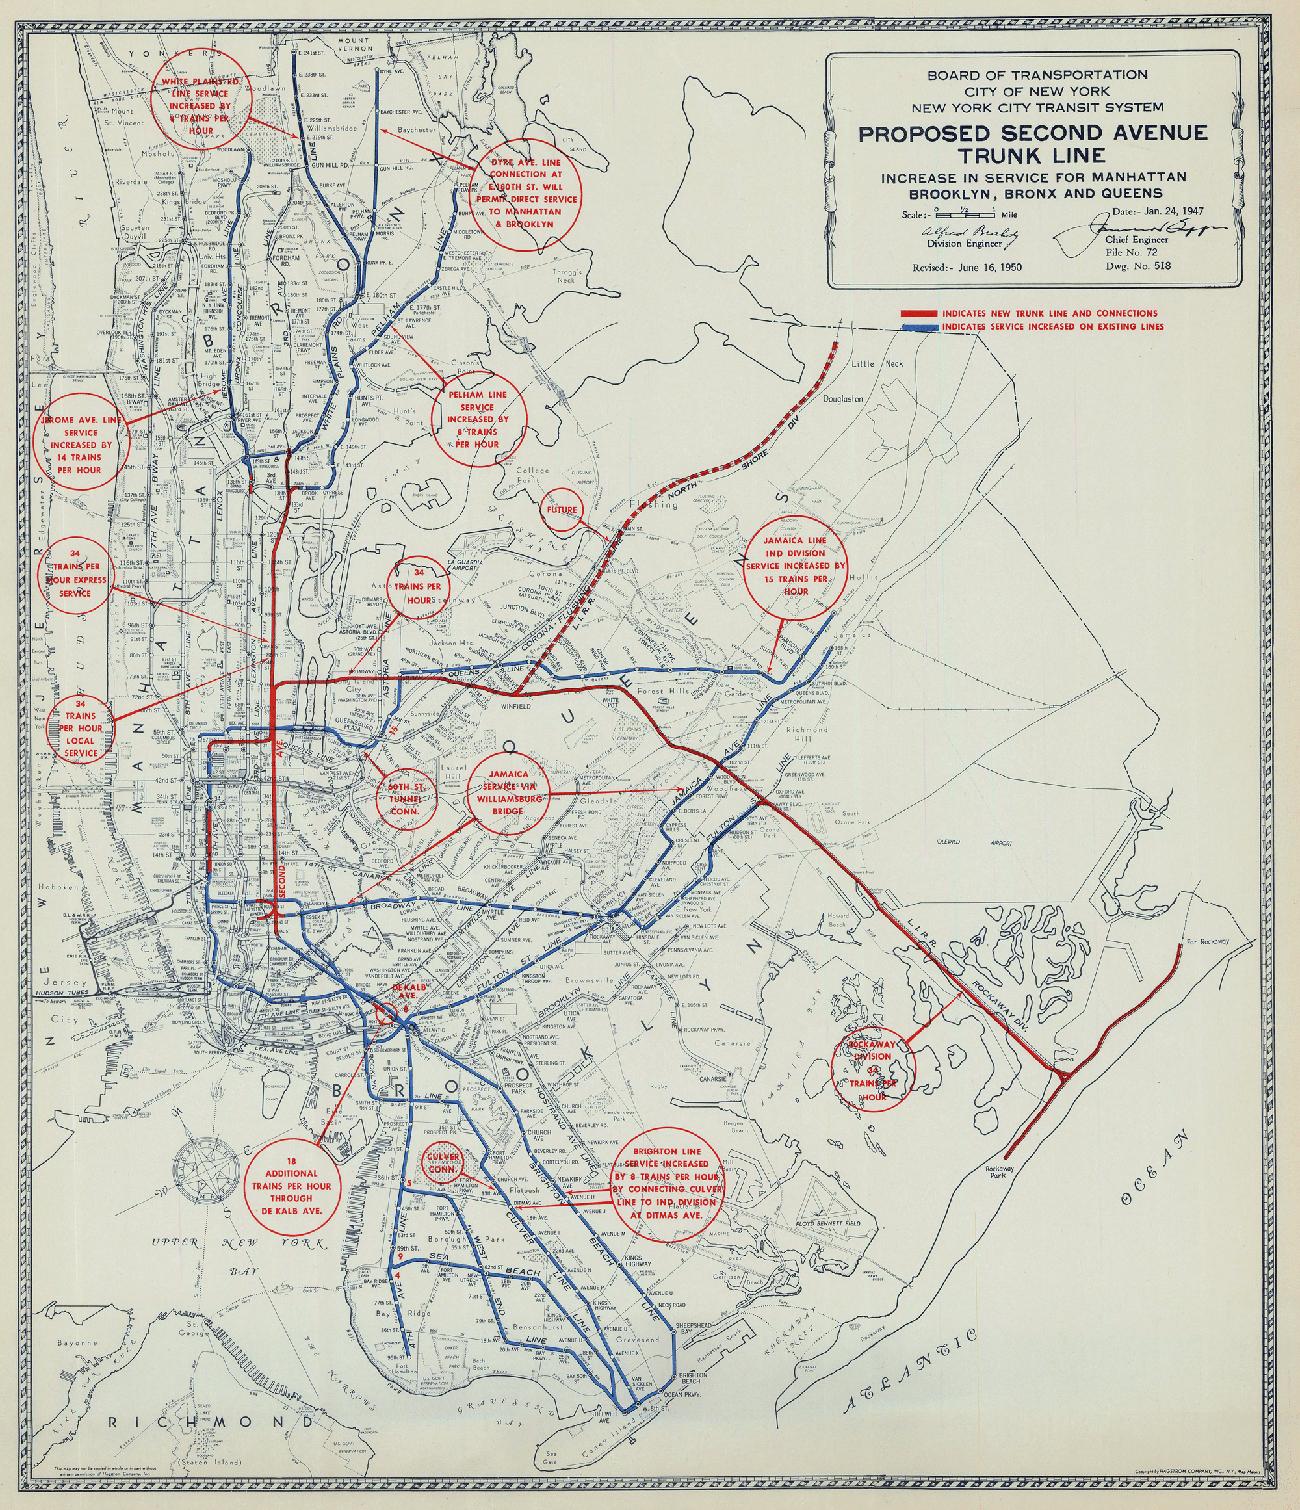 1. Proposed Second Avenue line